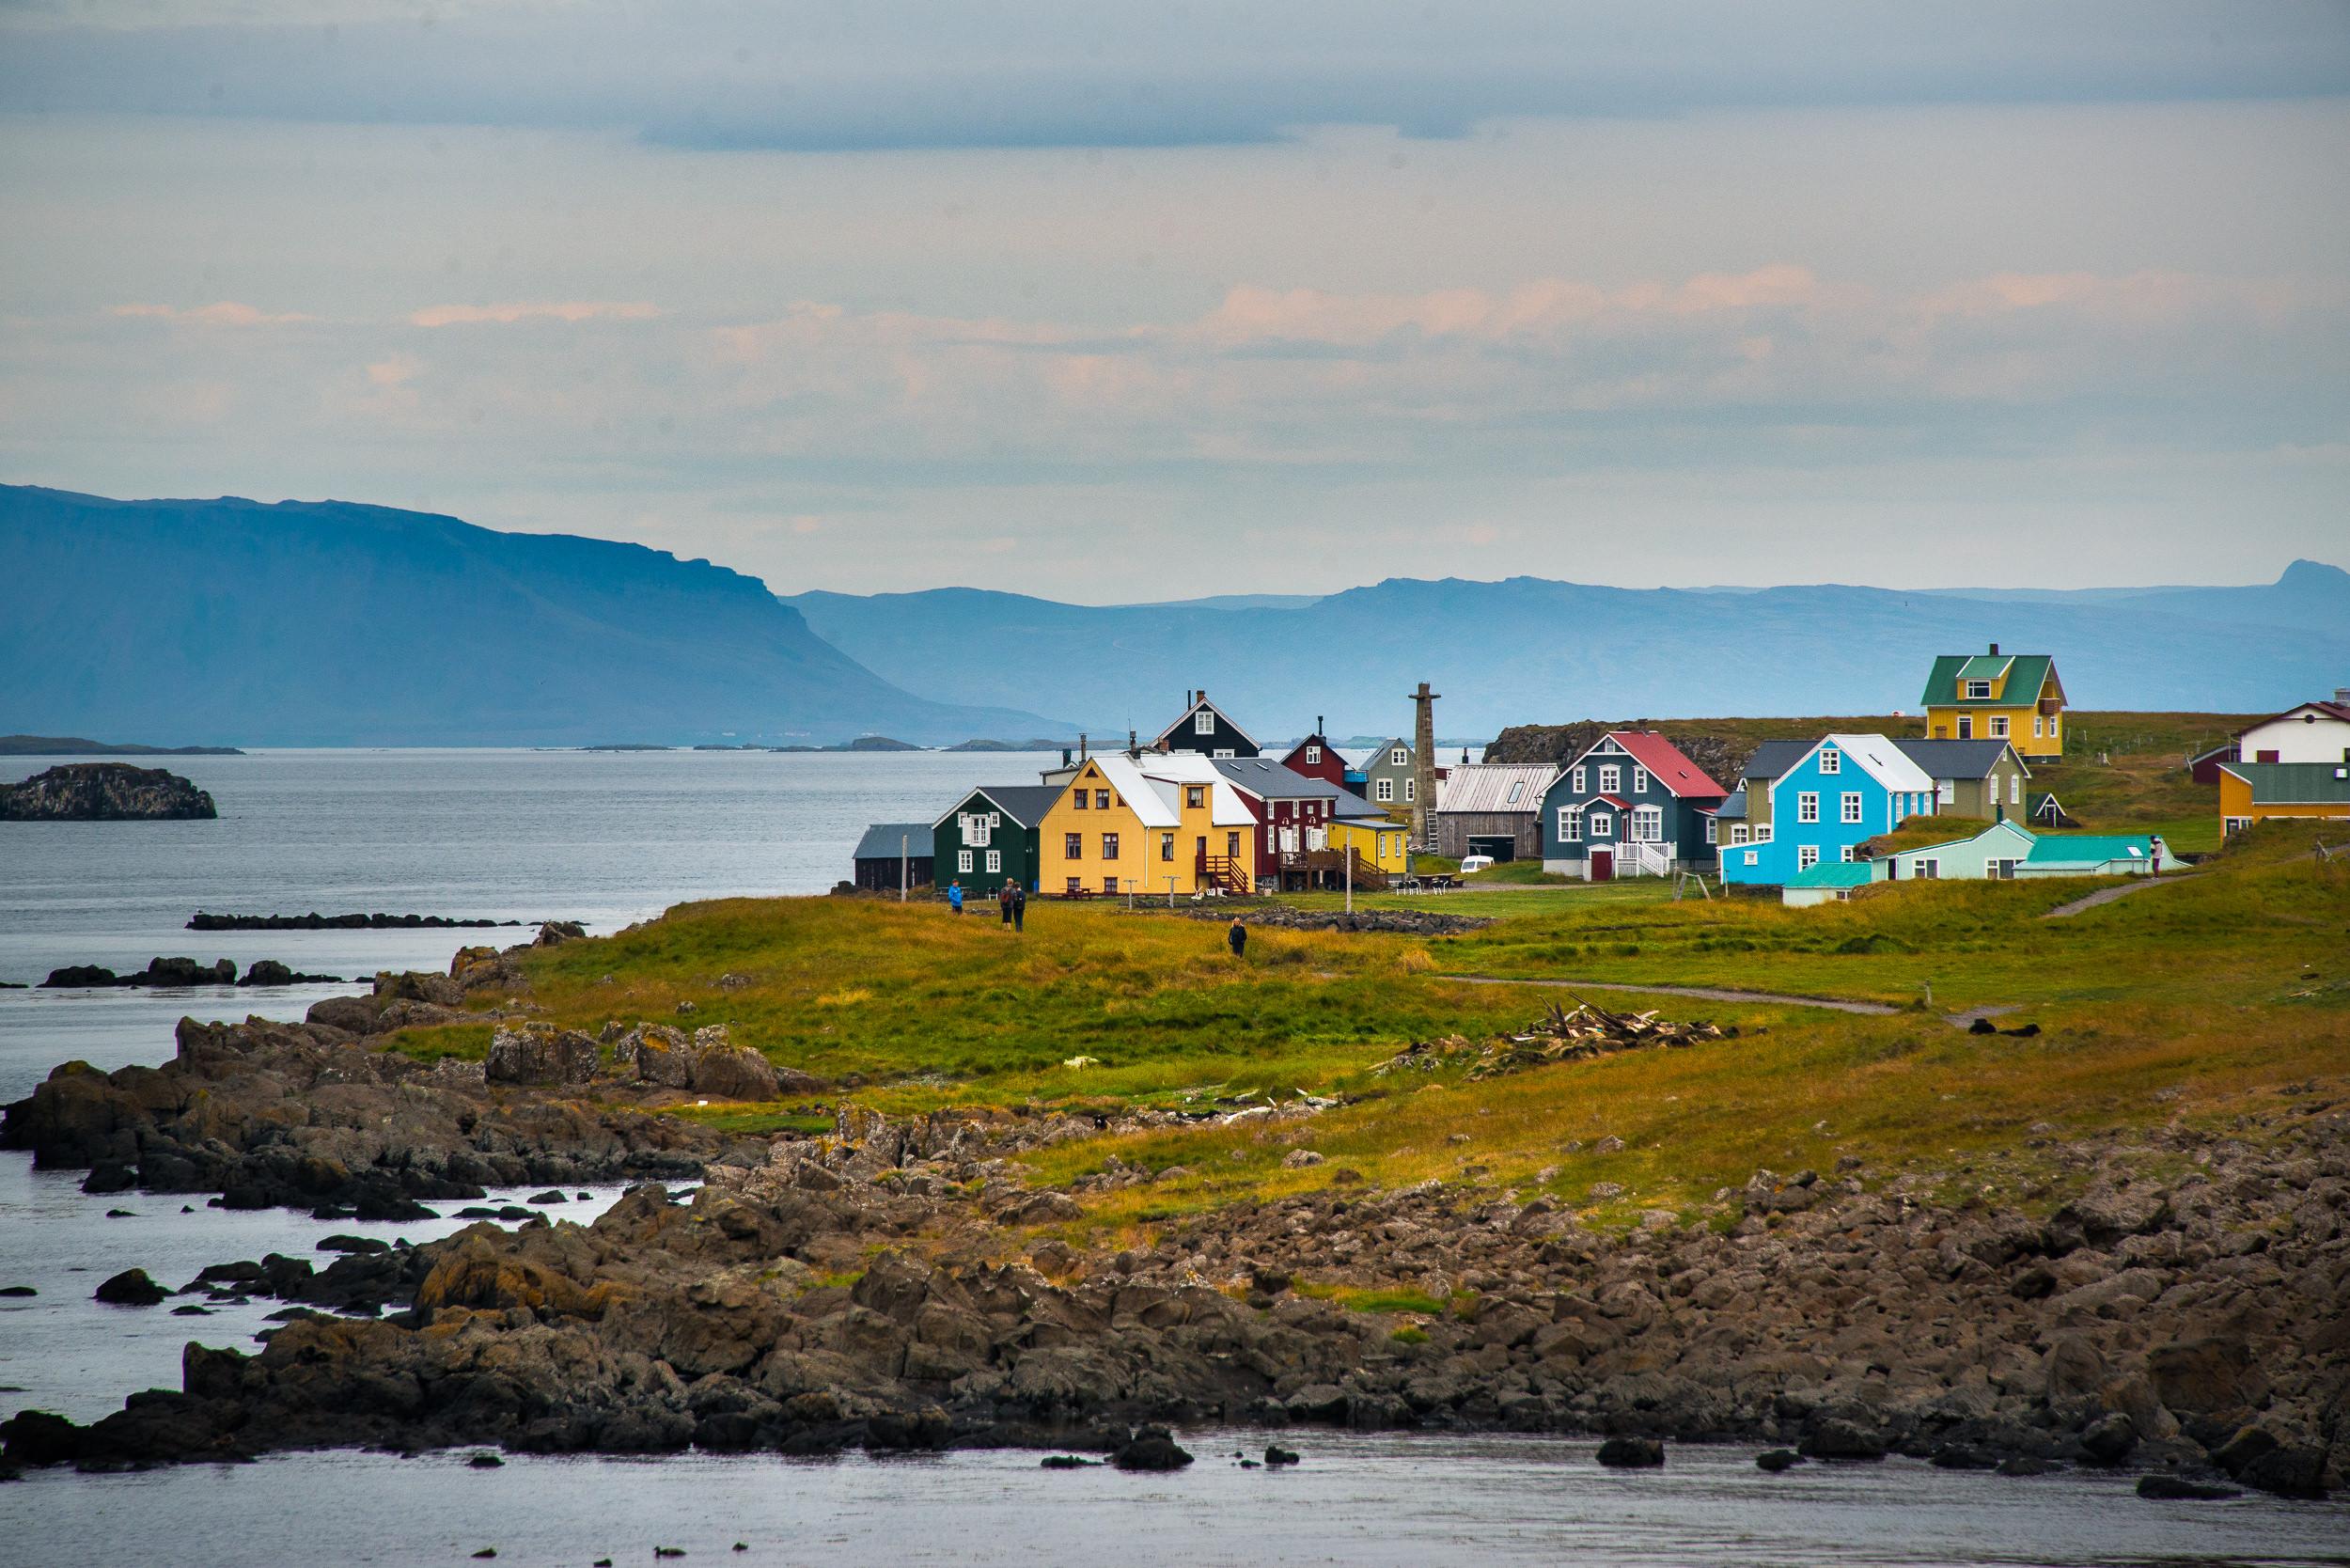 [2012 08 12] Iceland Snaefellsas1 NIKON D800 (4202).jpg